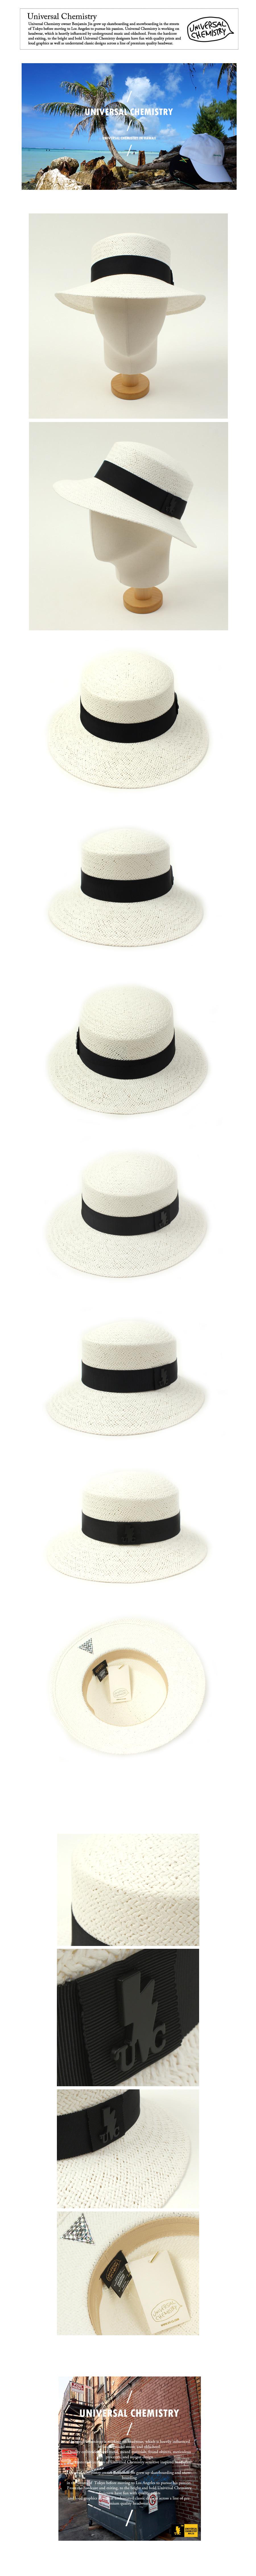 Unbal White Panama Hat 라피아햇